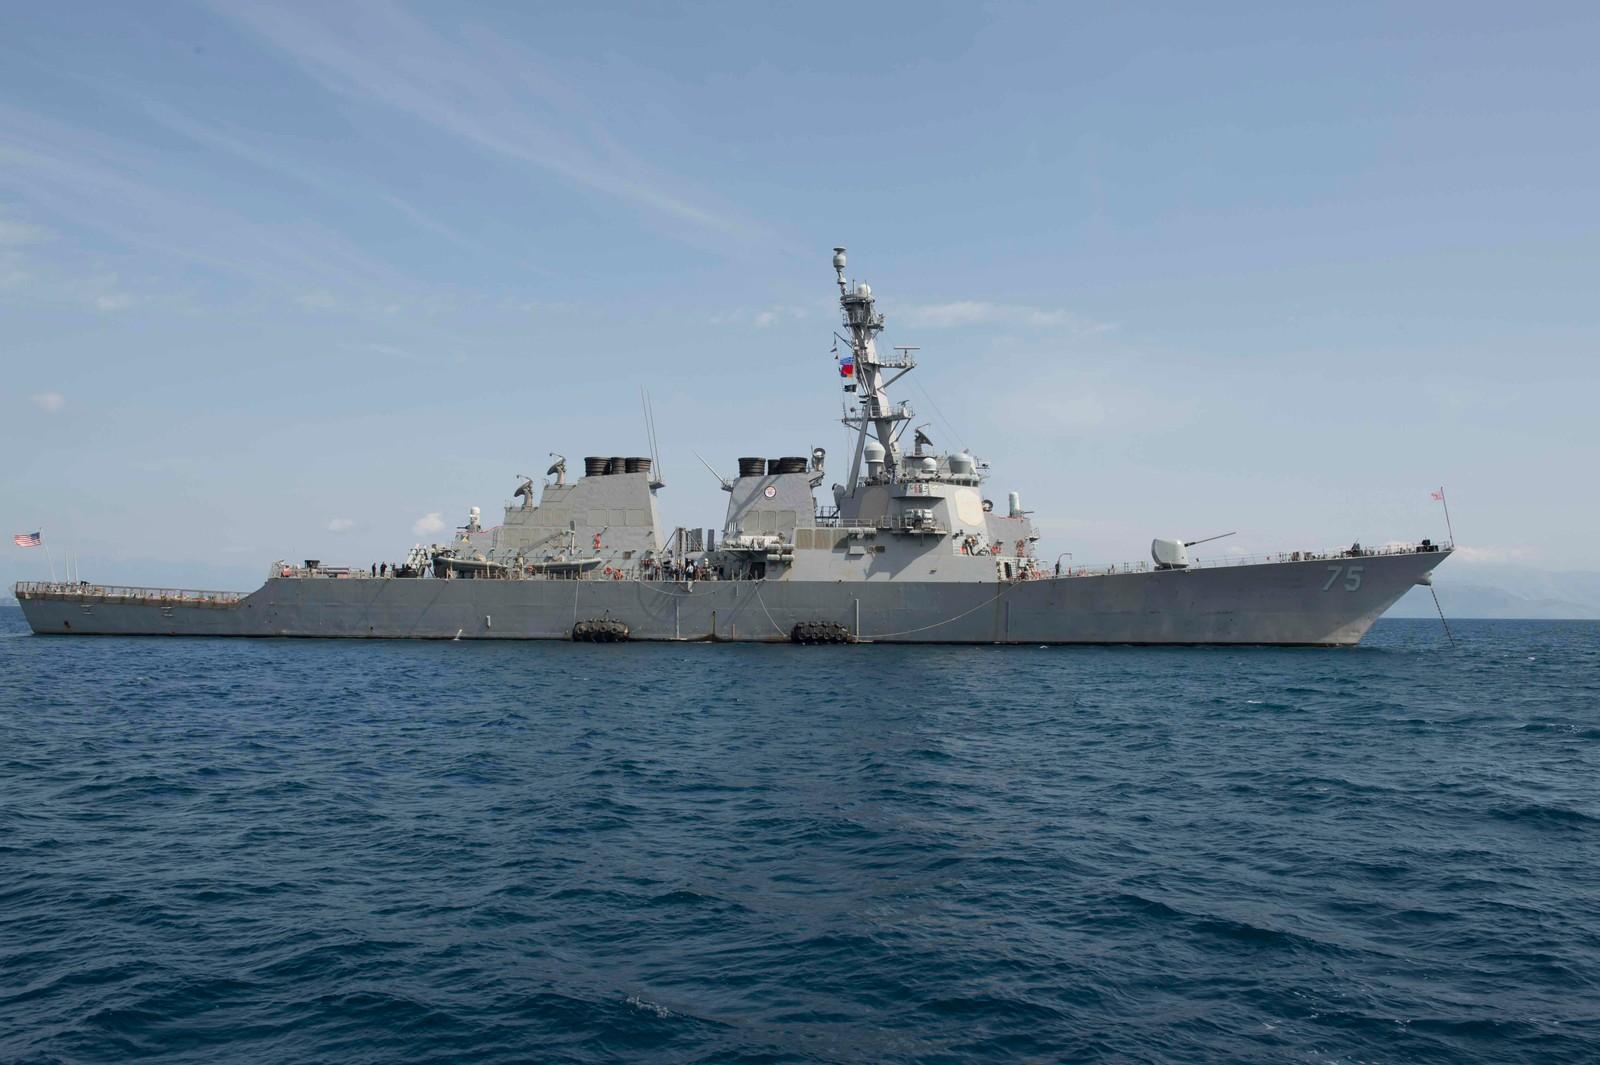 Det er det amerikanske skipet Donald Cook som ligger i Østersjøen som fikk et ublidt møte med russiske jagerfly.